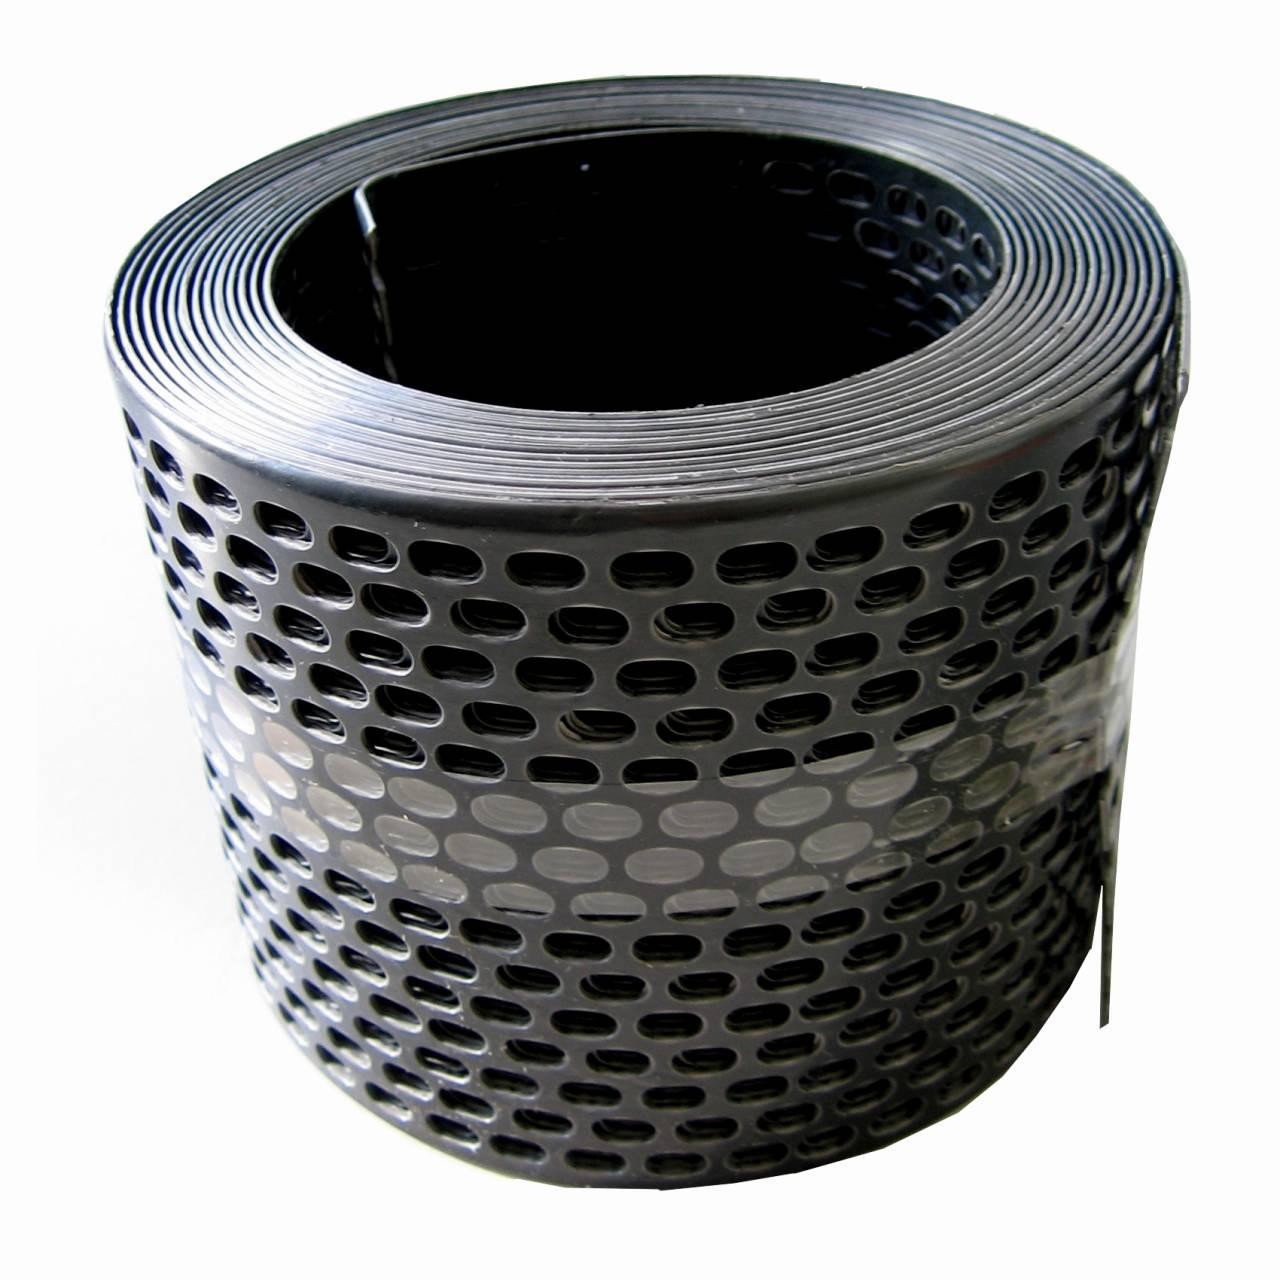 Traufgitter 150 mm schwarz / Rolle a 5 lfm